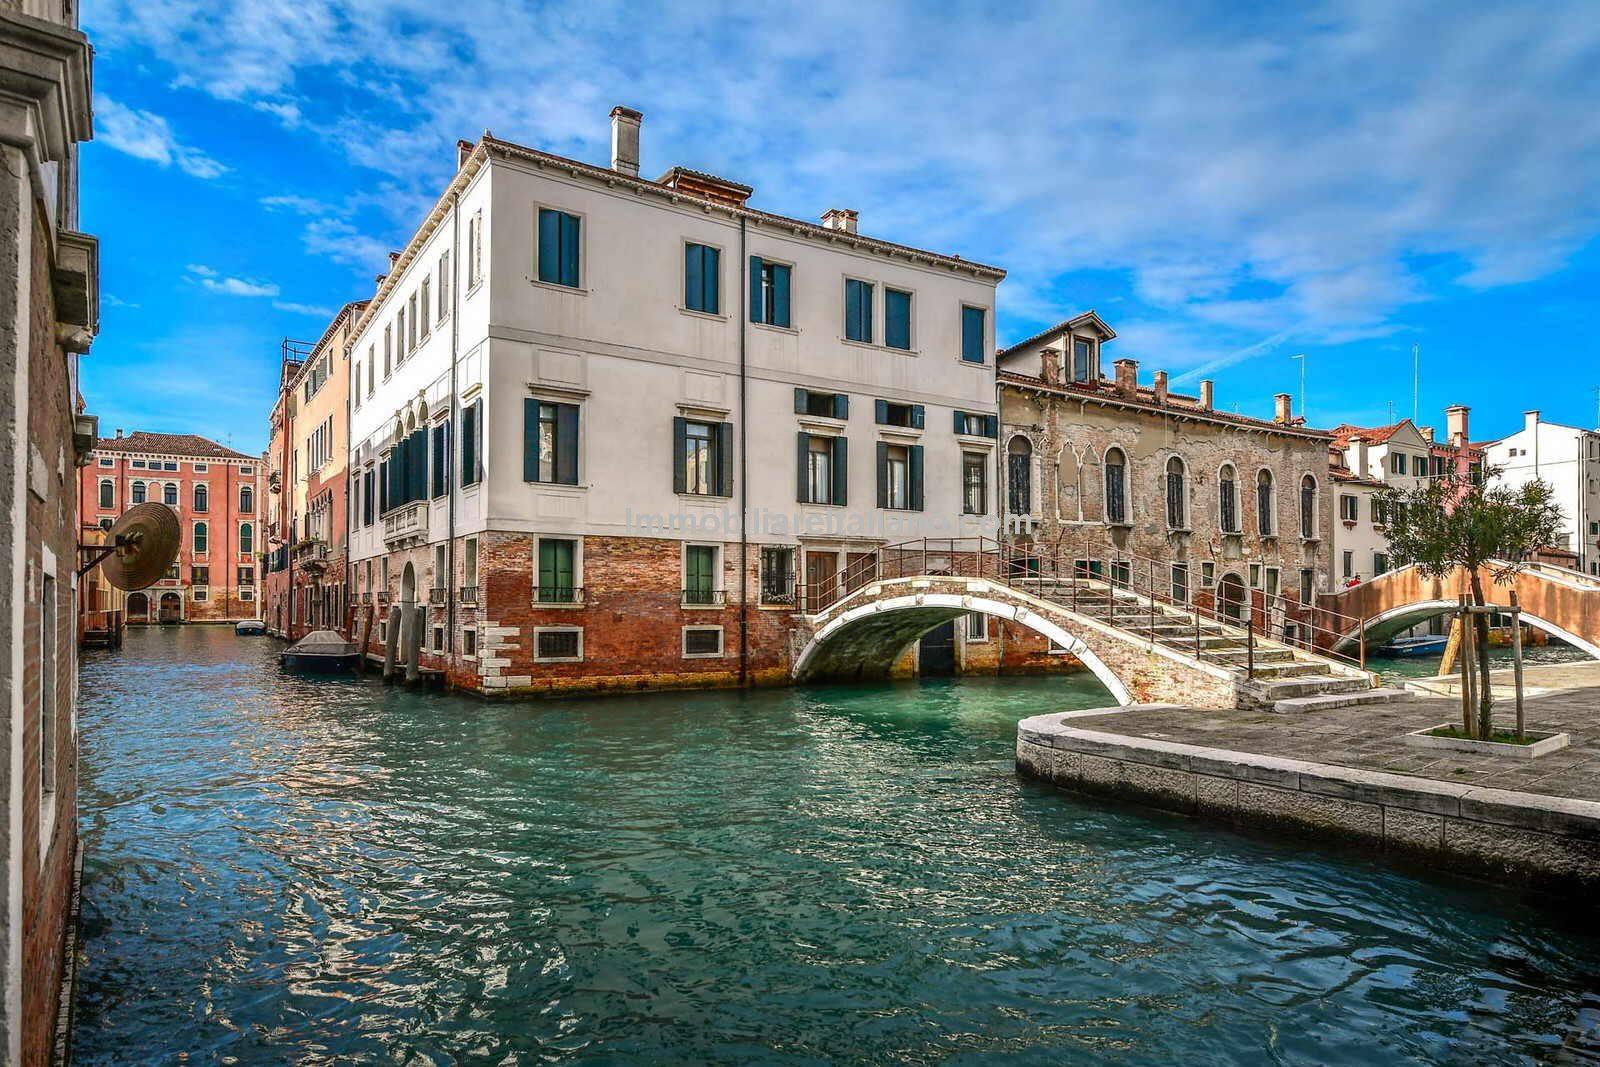 External view of Venice canal city centre apartment